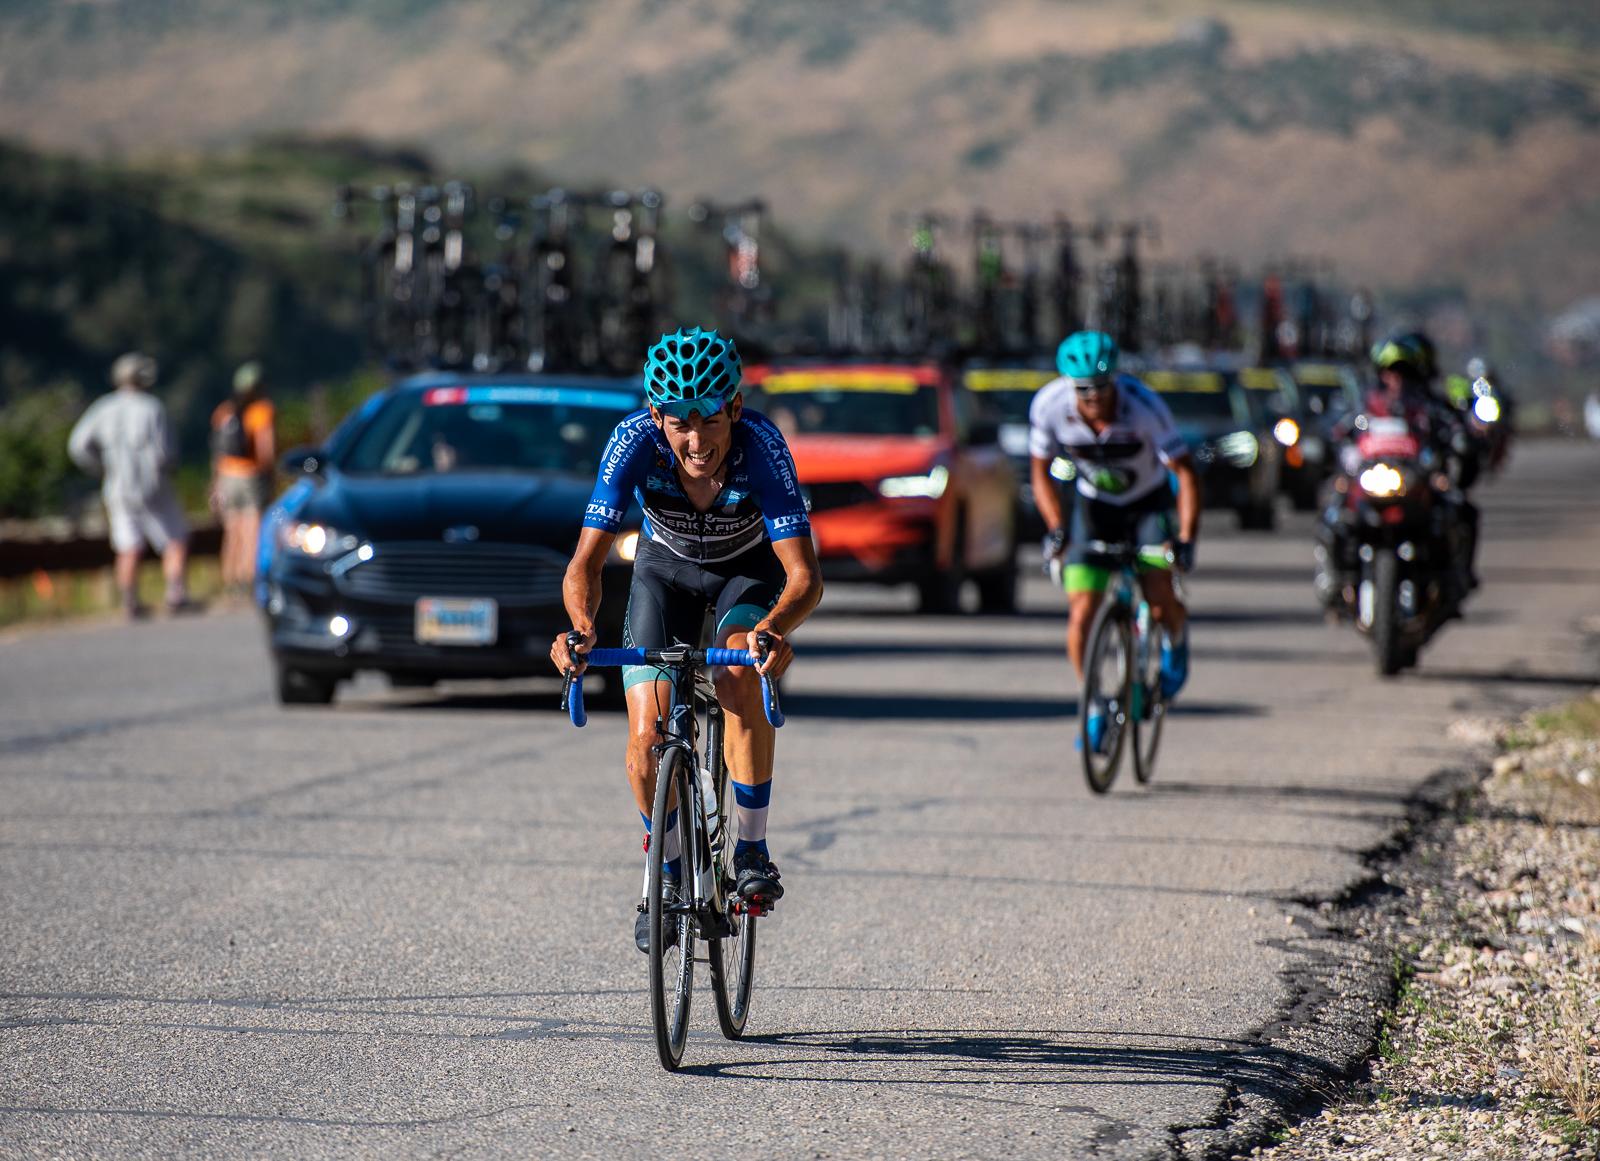 Fan Favorite Bernat Font Mas (303 Project) Stage 5, 2019 Tour of Utah. Photo by Steven L. Sheffield